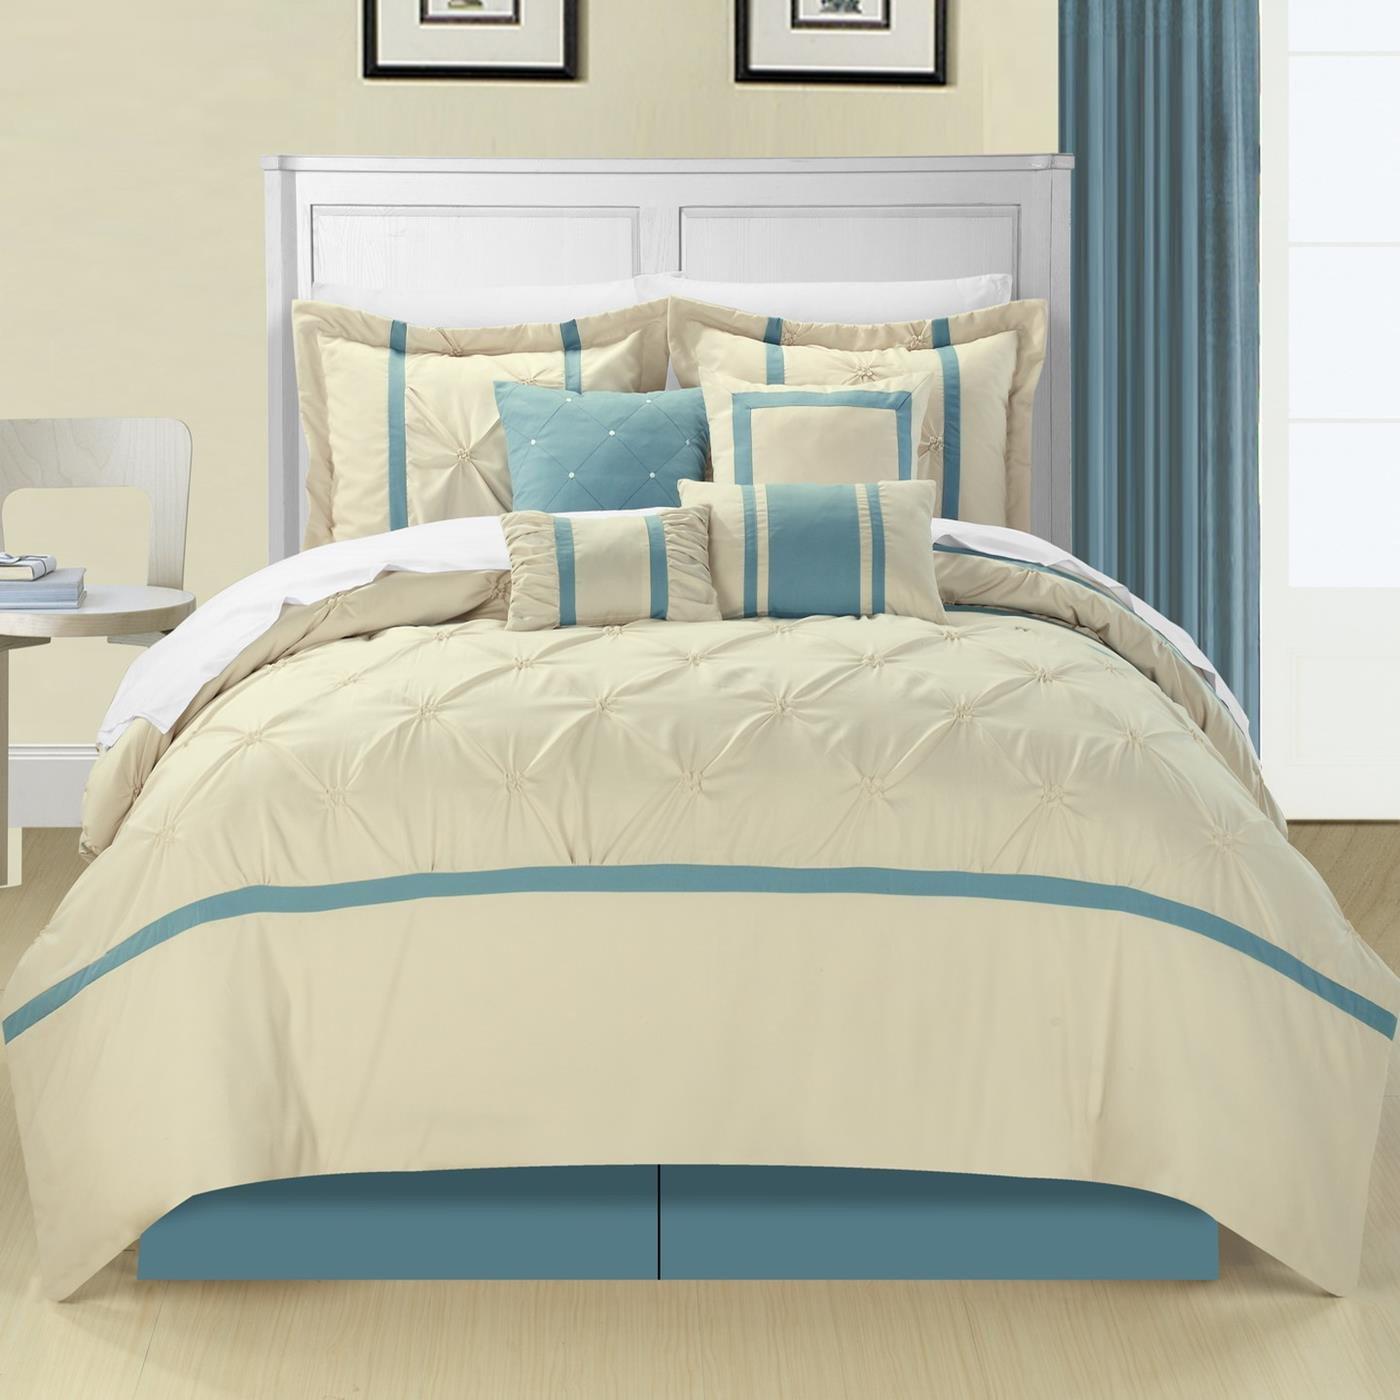 Beige 127CQ101-AN Chic Home 8-Piece Vermont Embroidered Comforter Set Queen